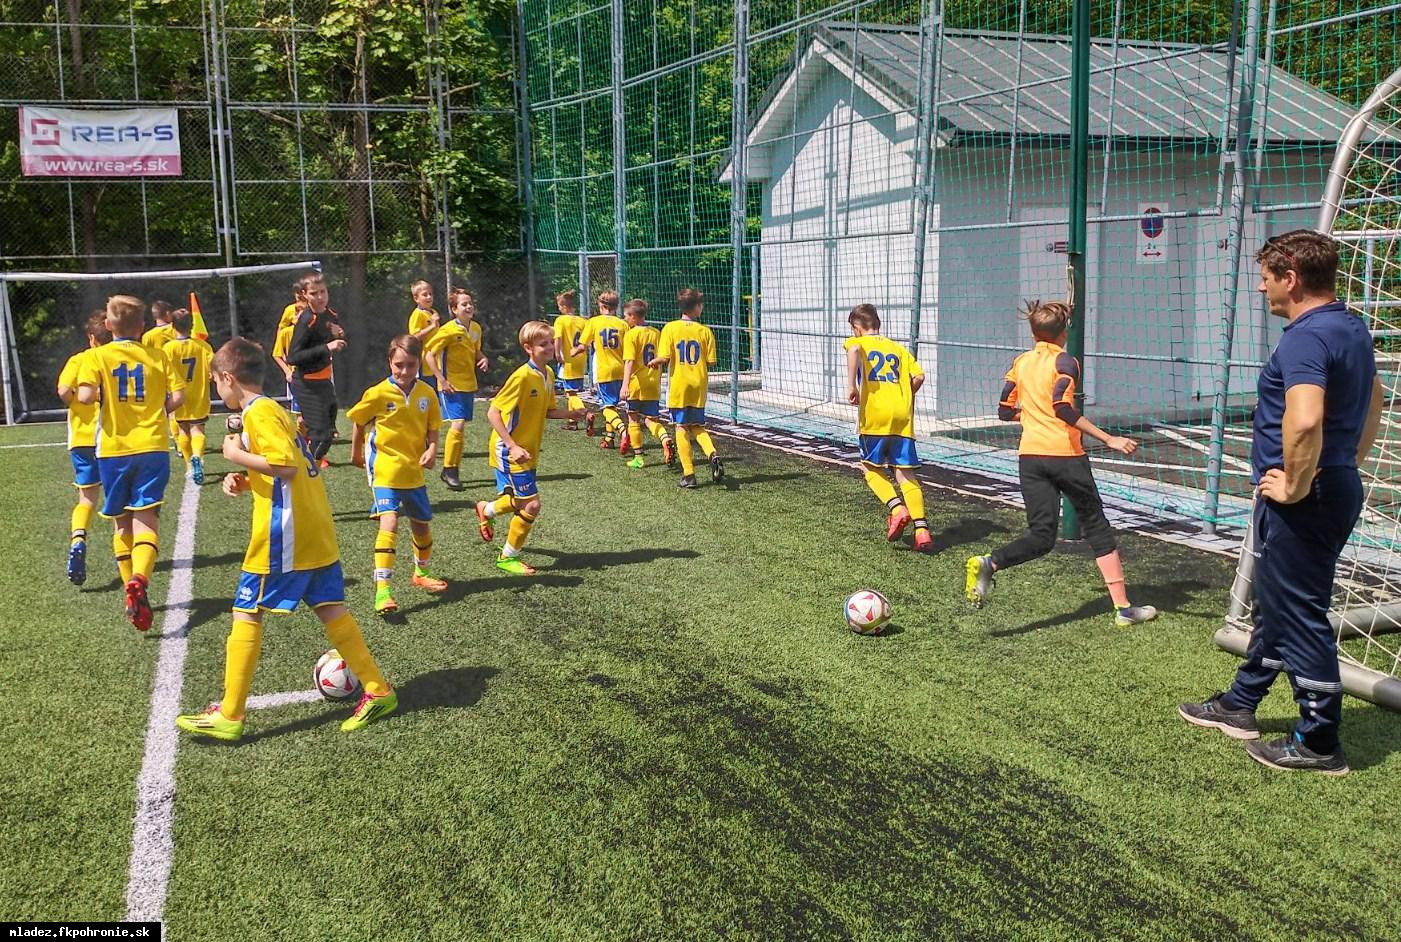 U12: 20. kolo I.LMŽ FK Železiarne Podbrezová 2.6.2019